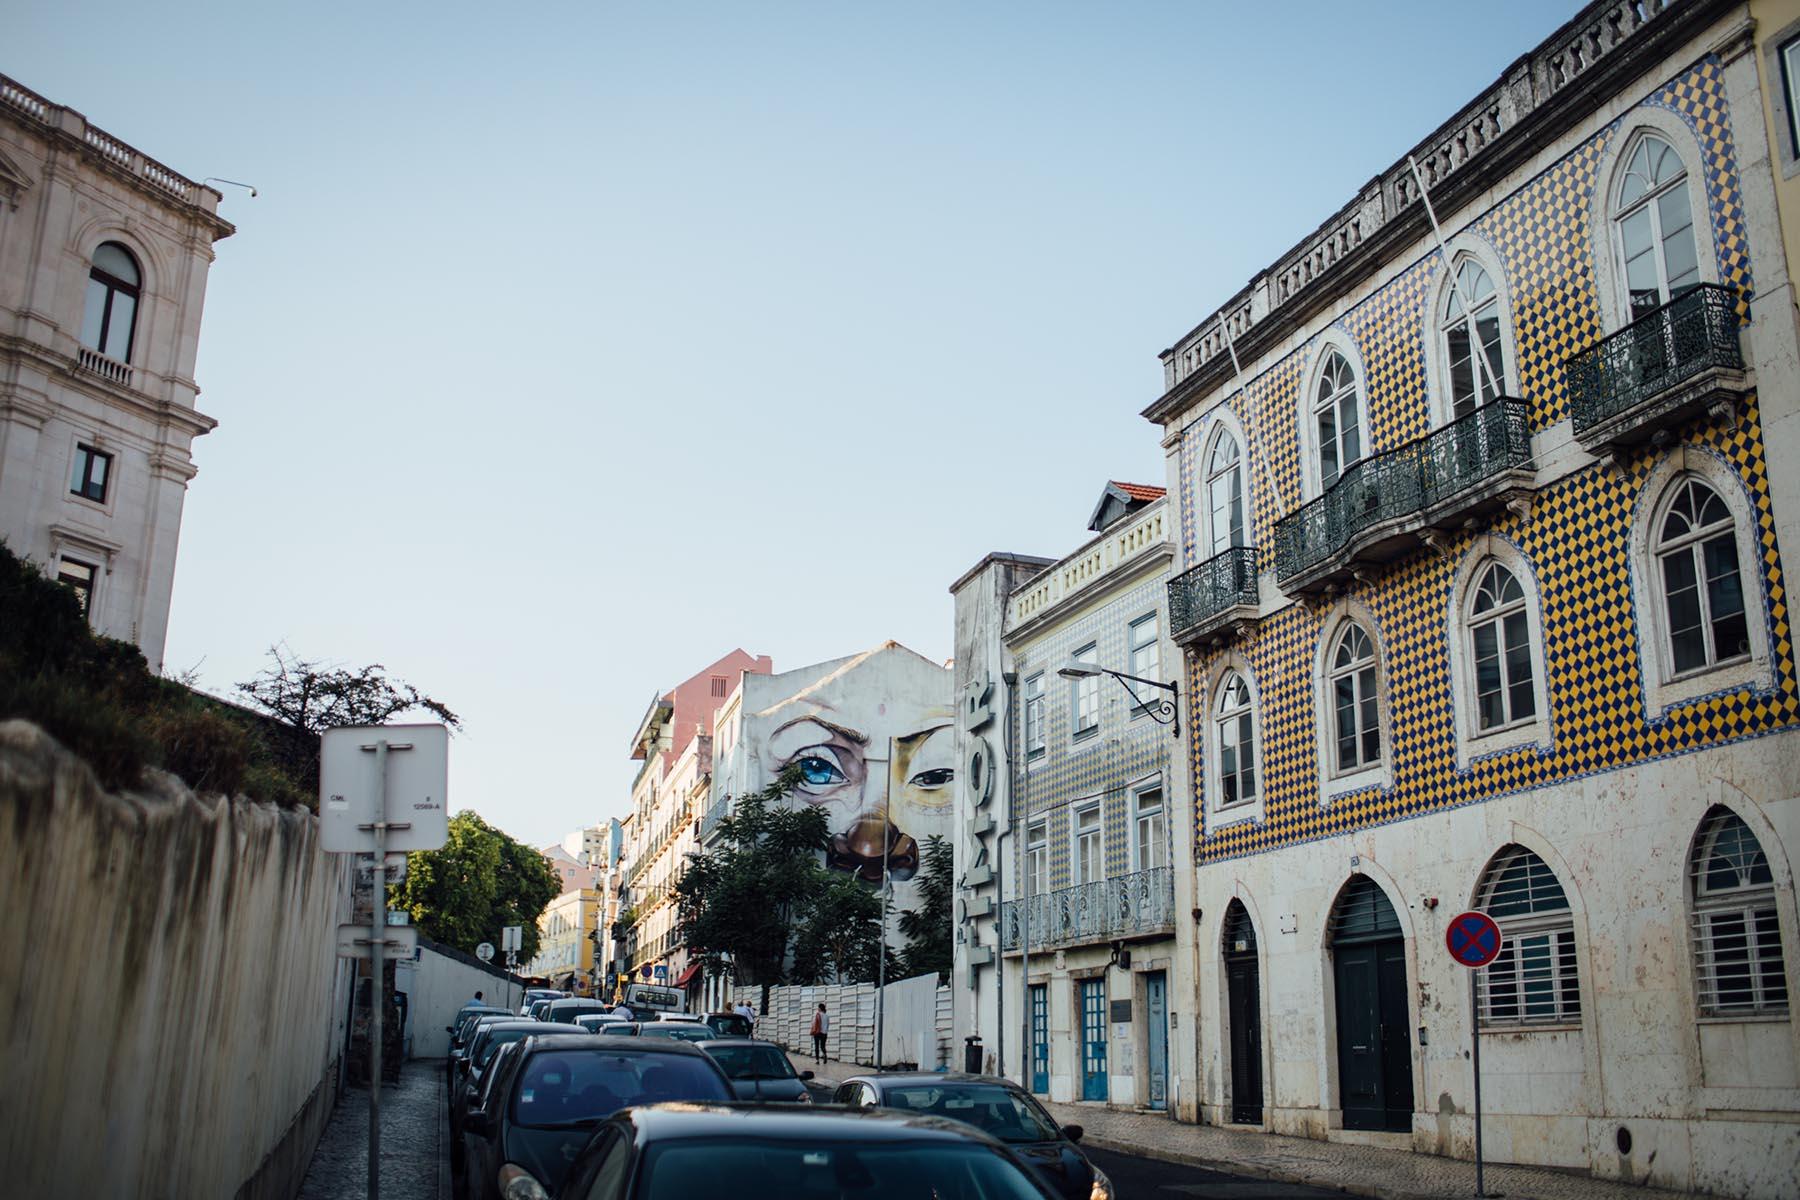 lissabon_streets_10.jpg